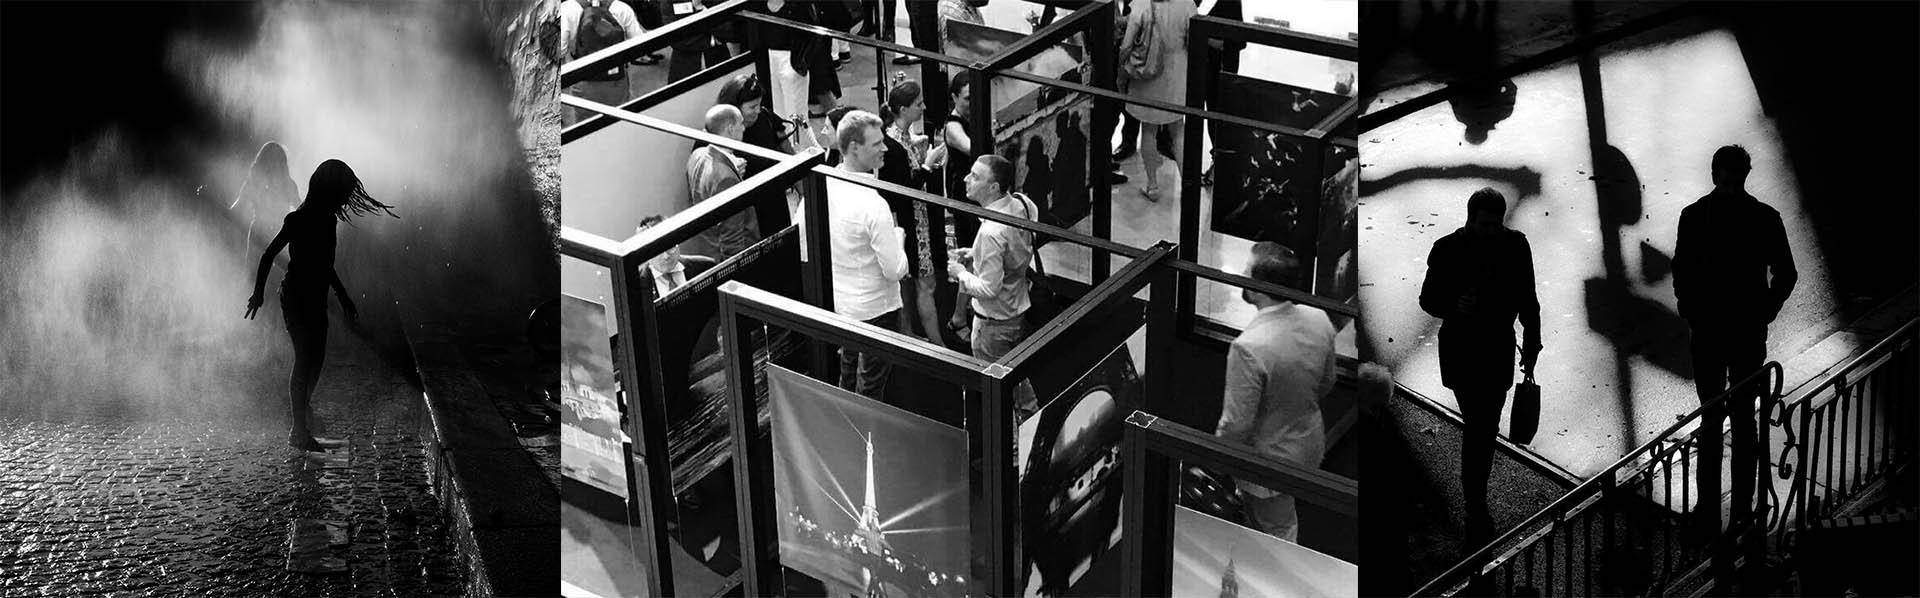 exposition photographique cadres